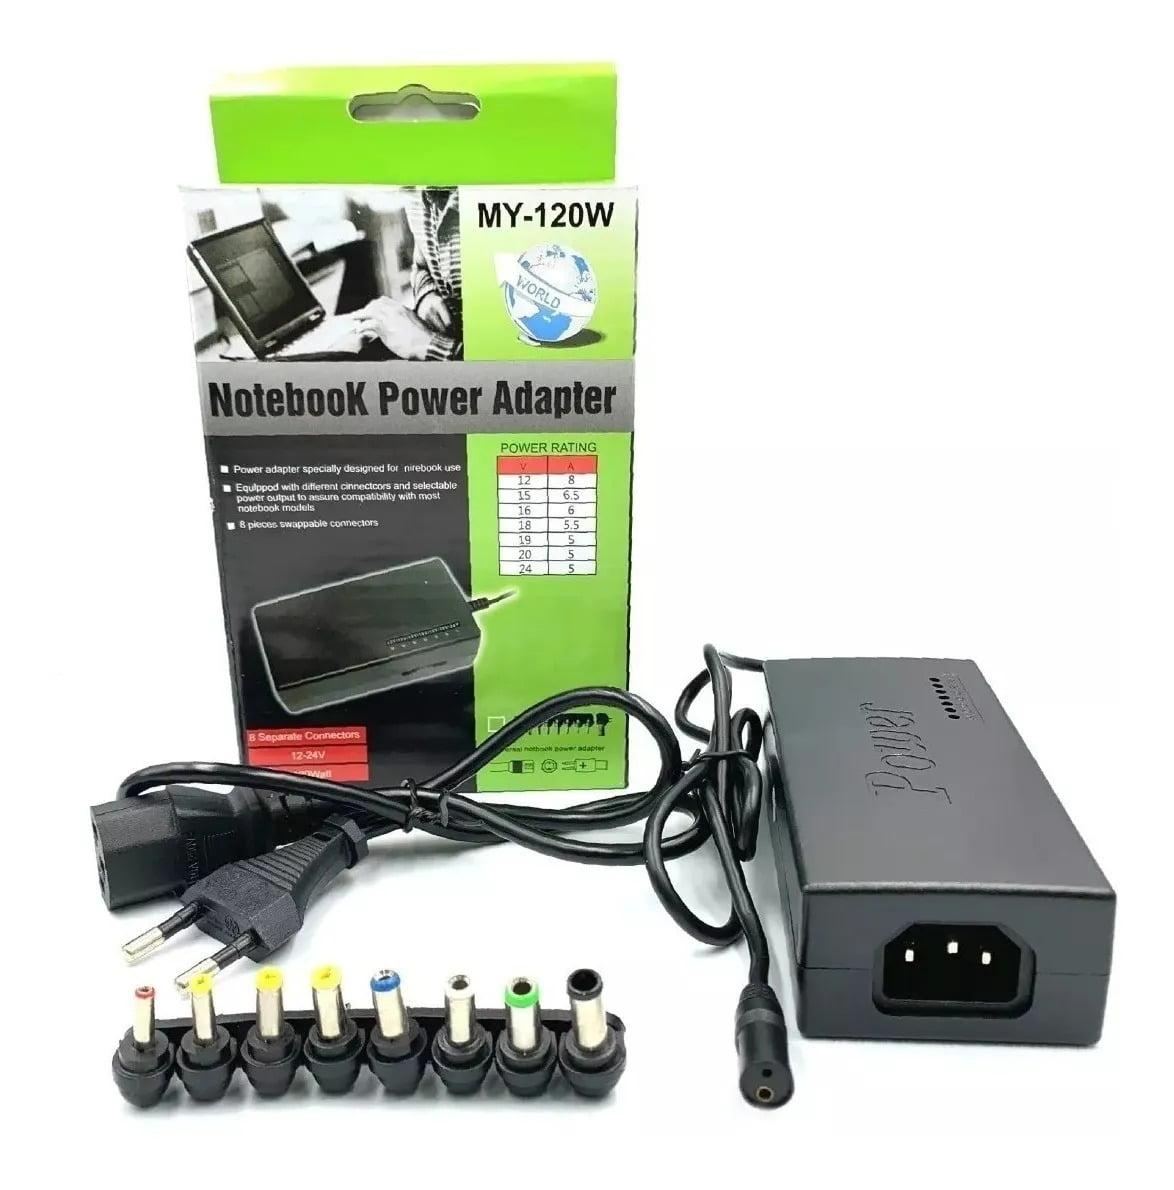 Notebook Power Adapter MY - 120W